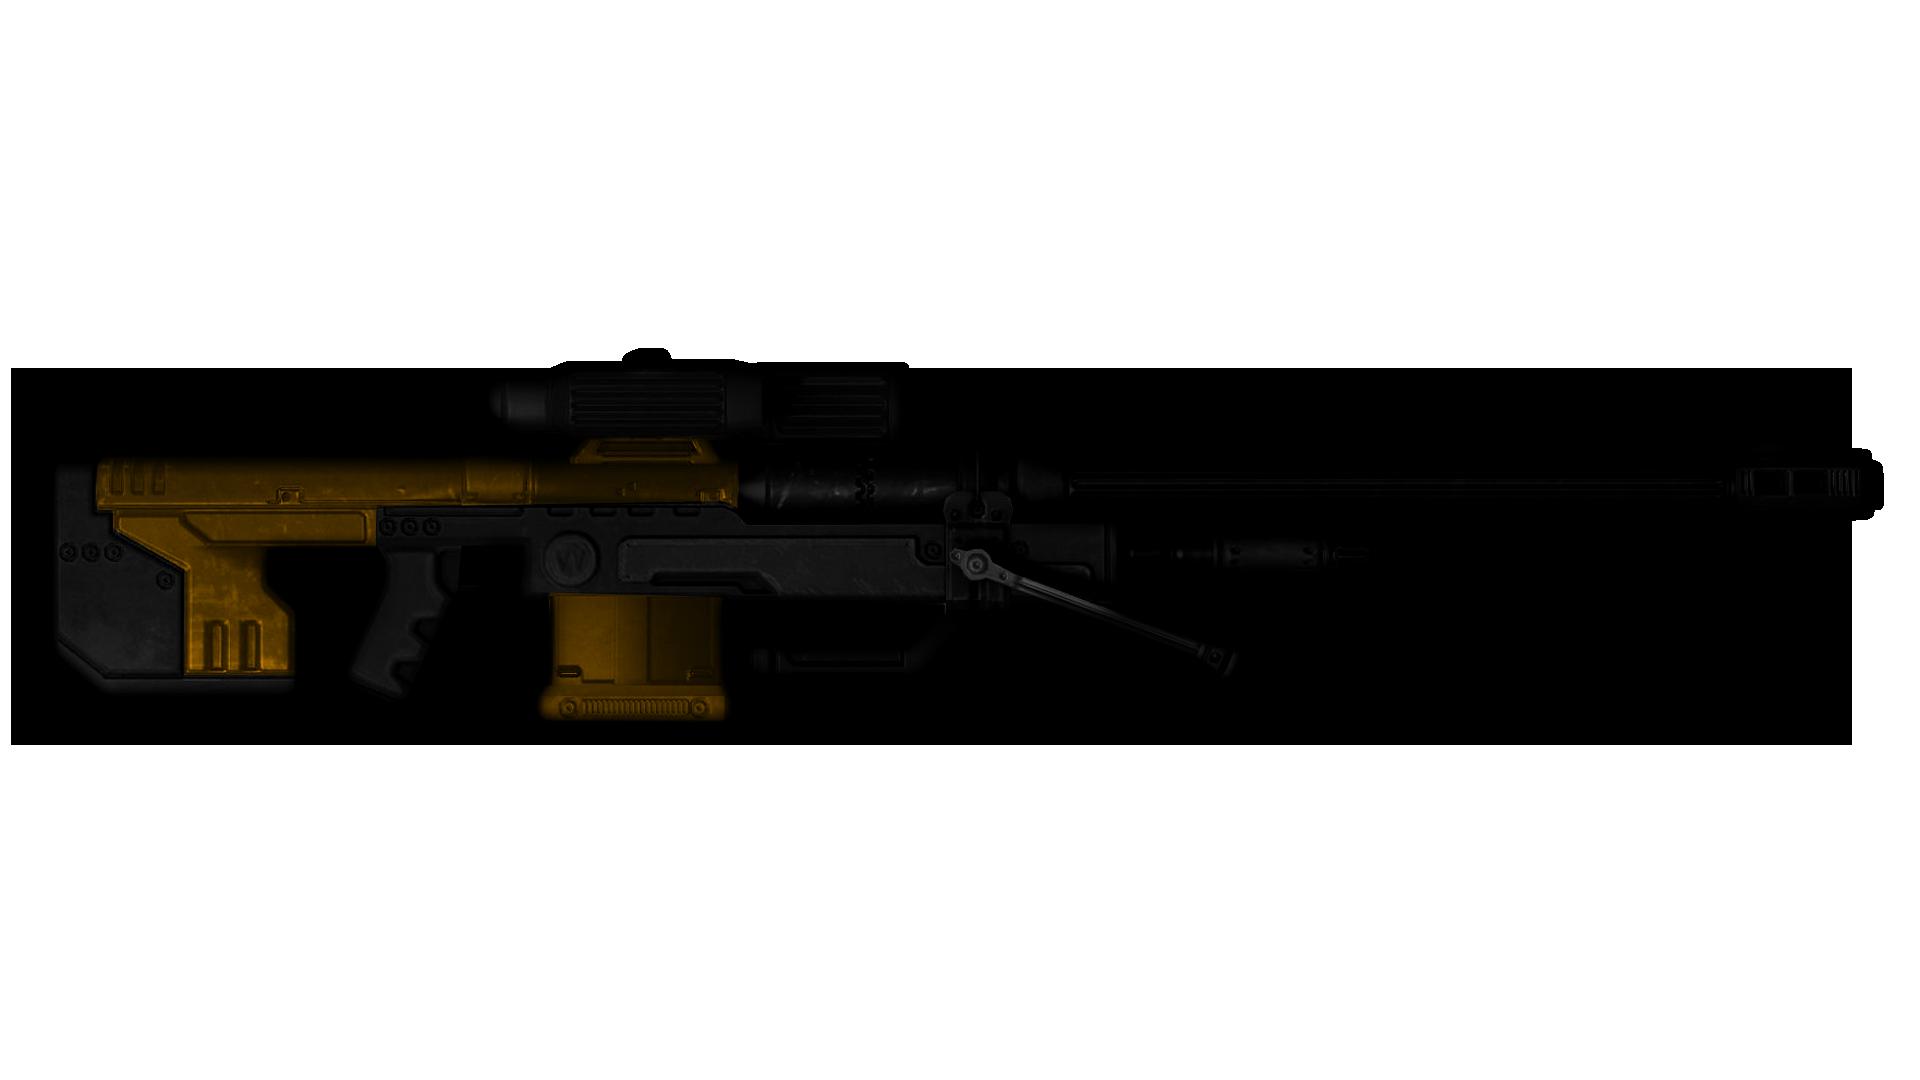 Jacob's Sniper Rifle